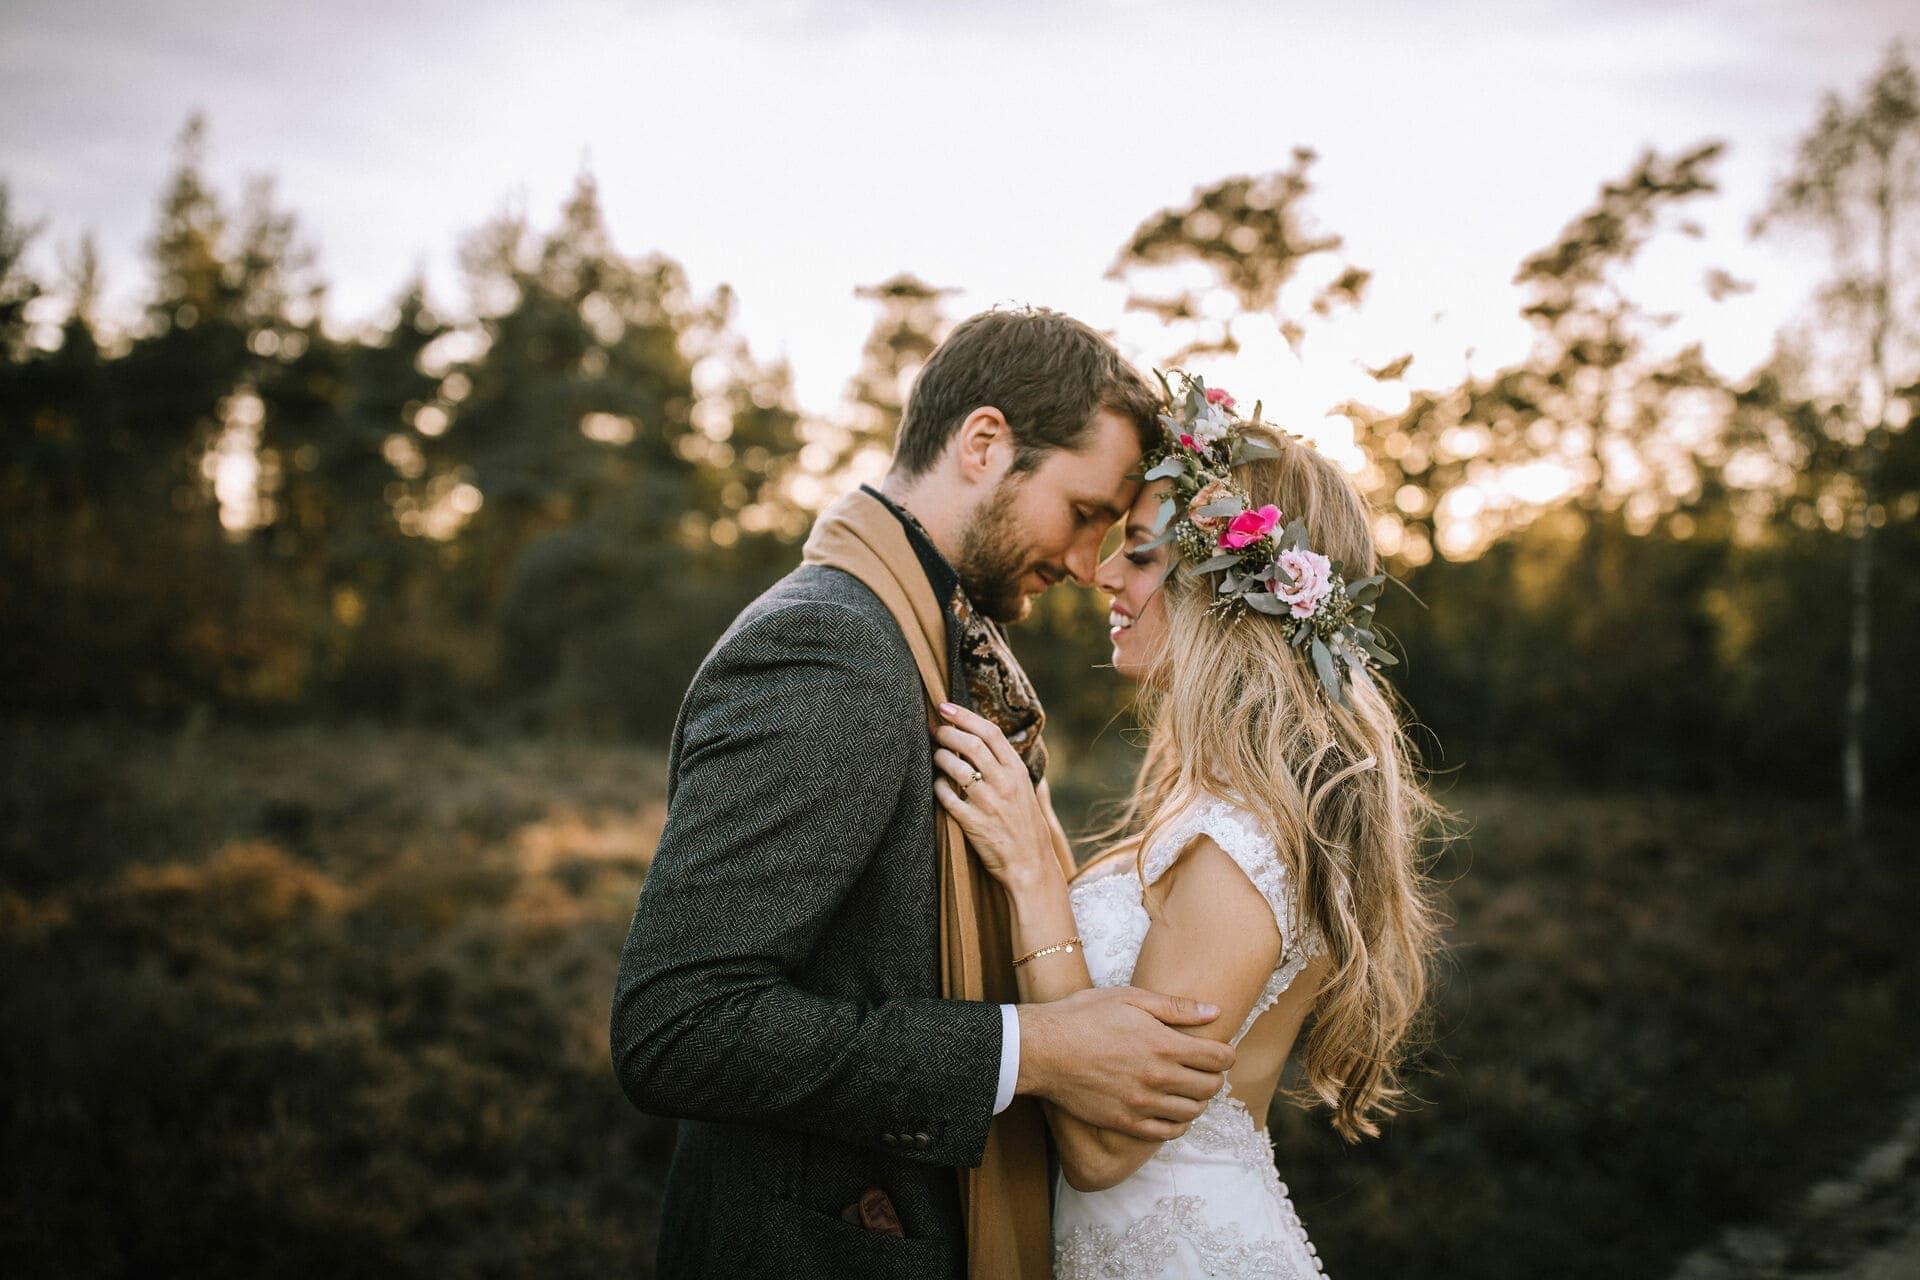 Beste dating site Auckland